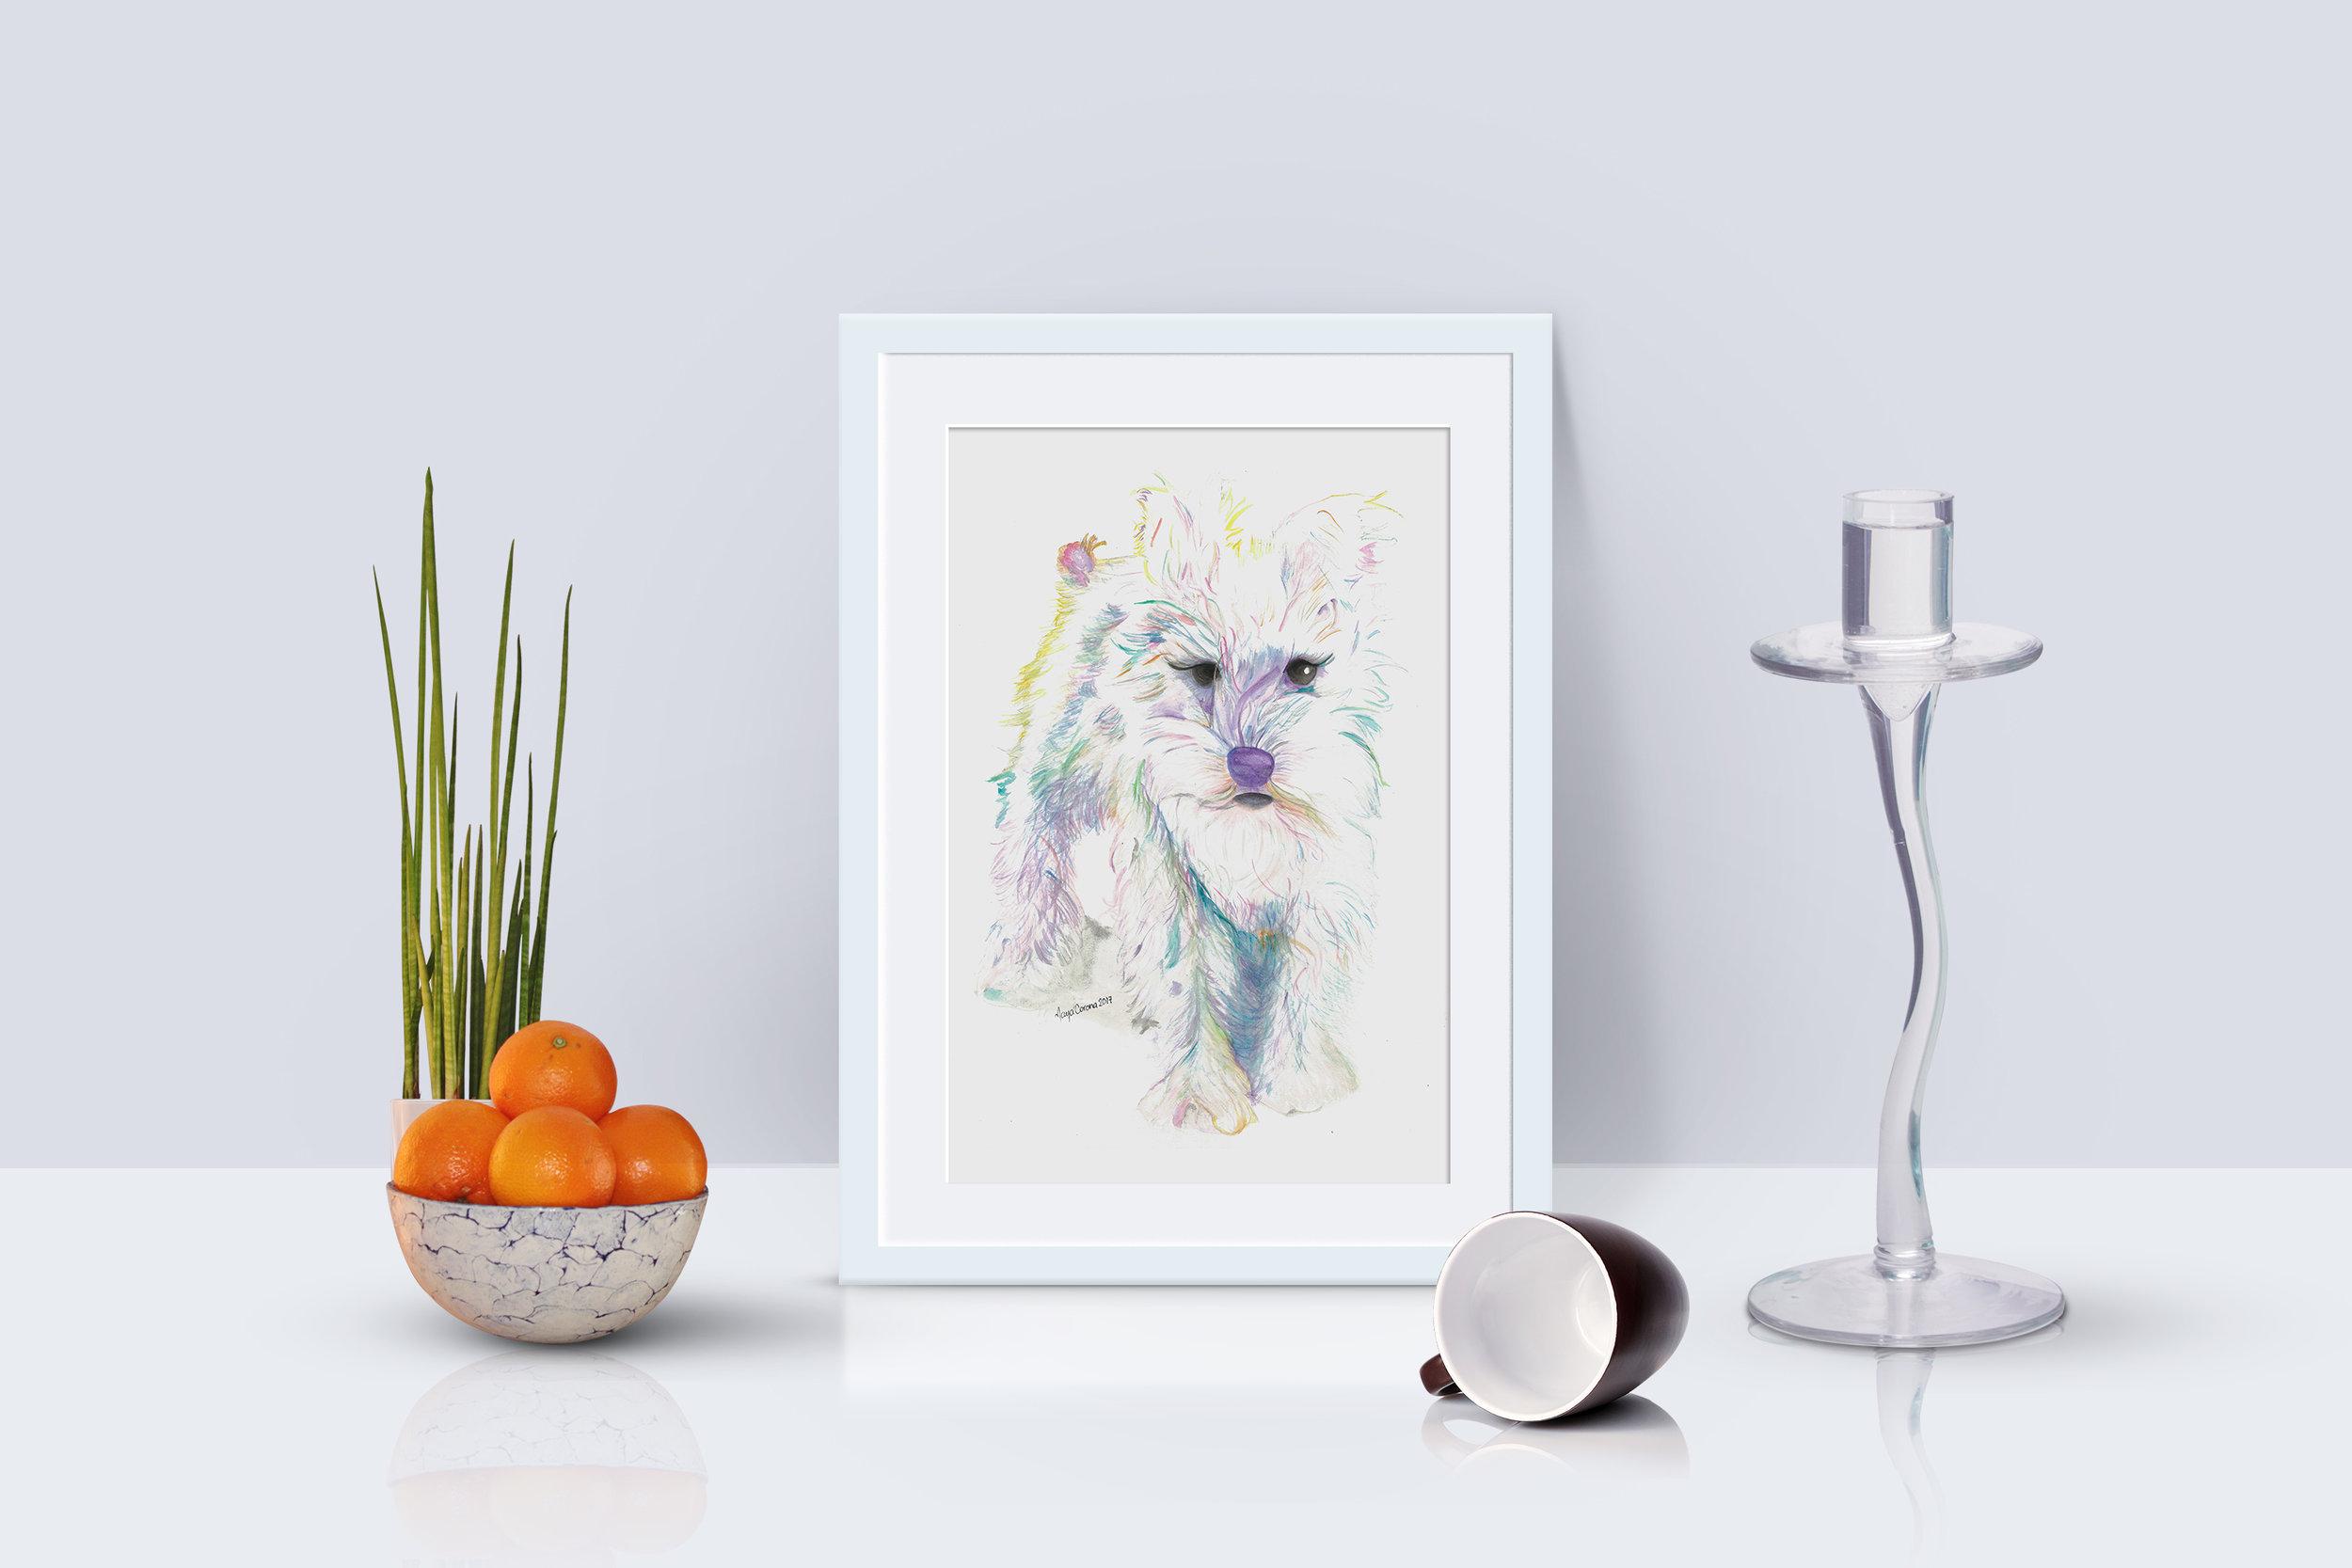 Copy of Schnauzer Watercolour pet portrait by Maya Corona